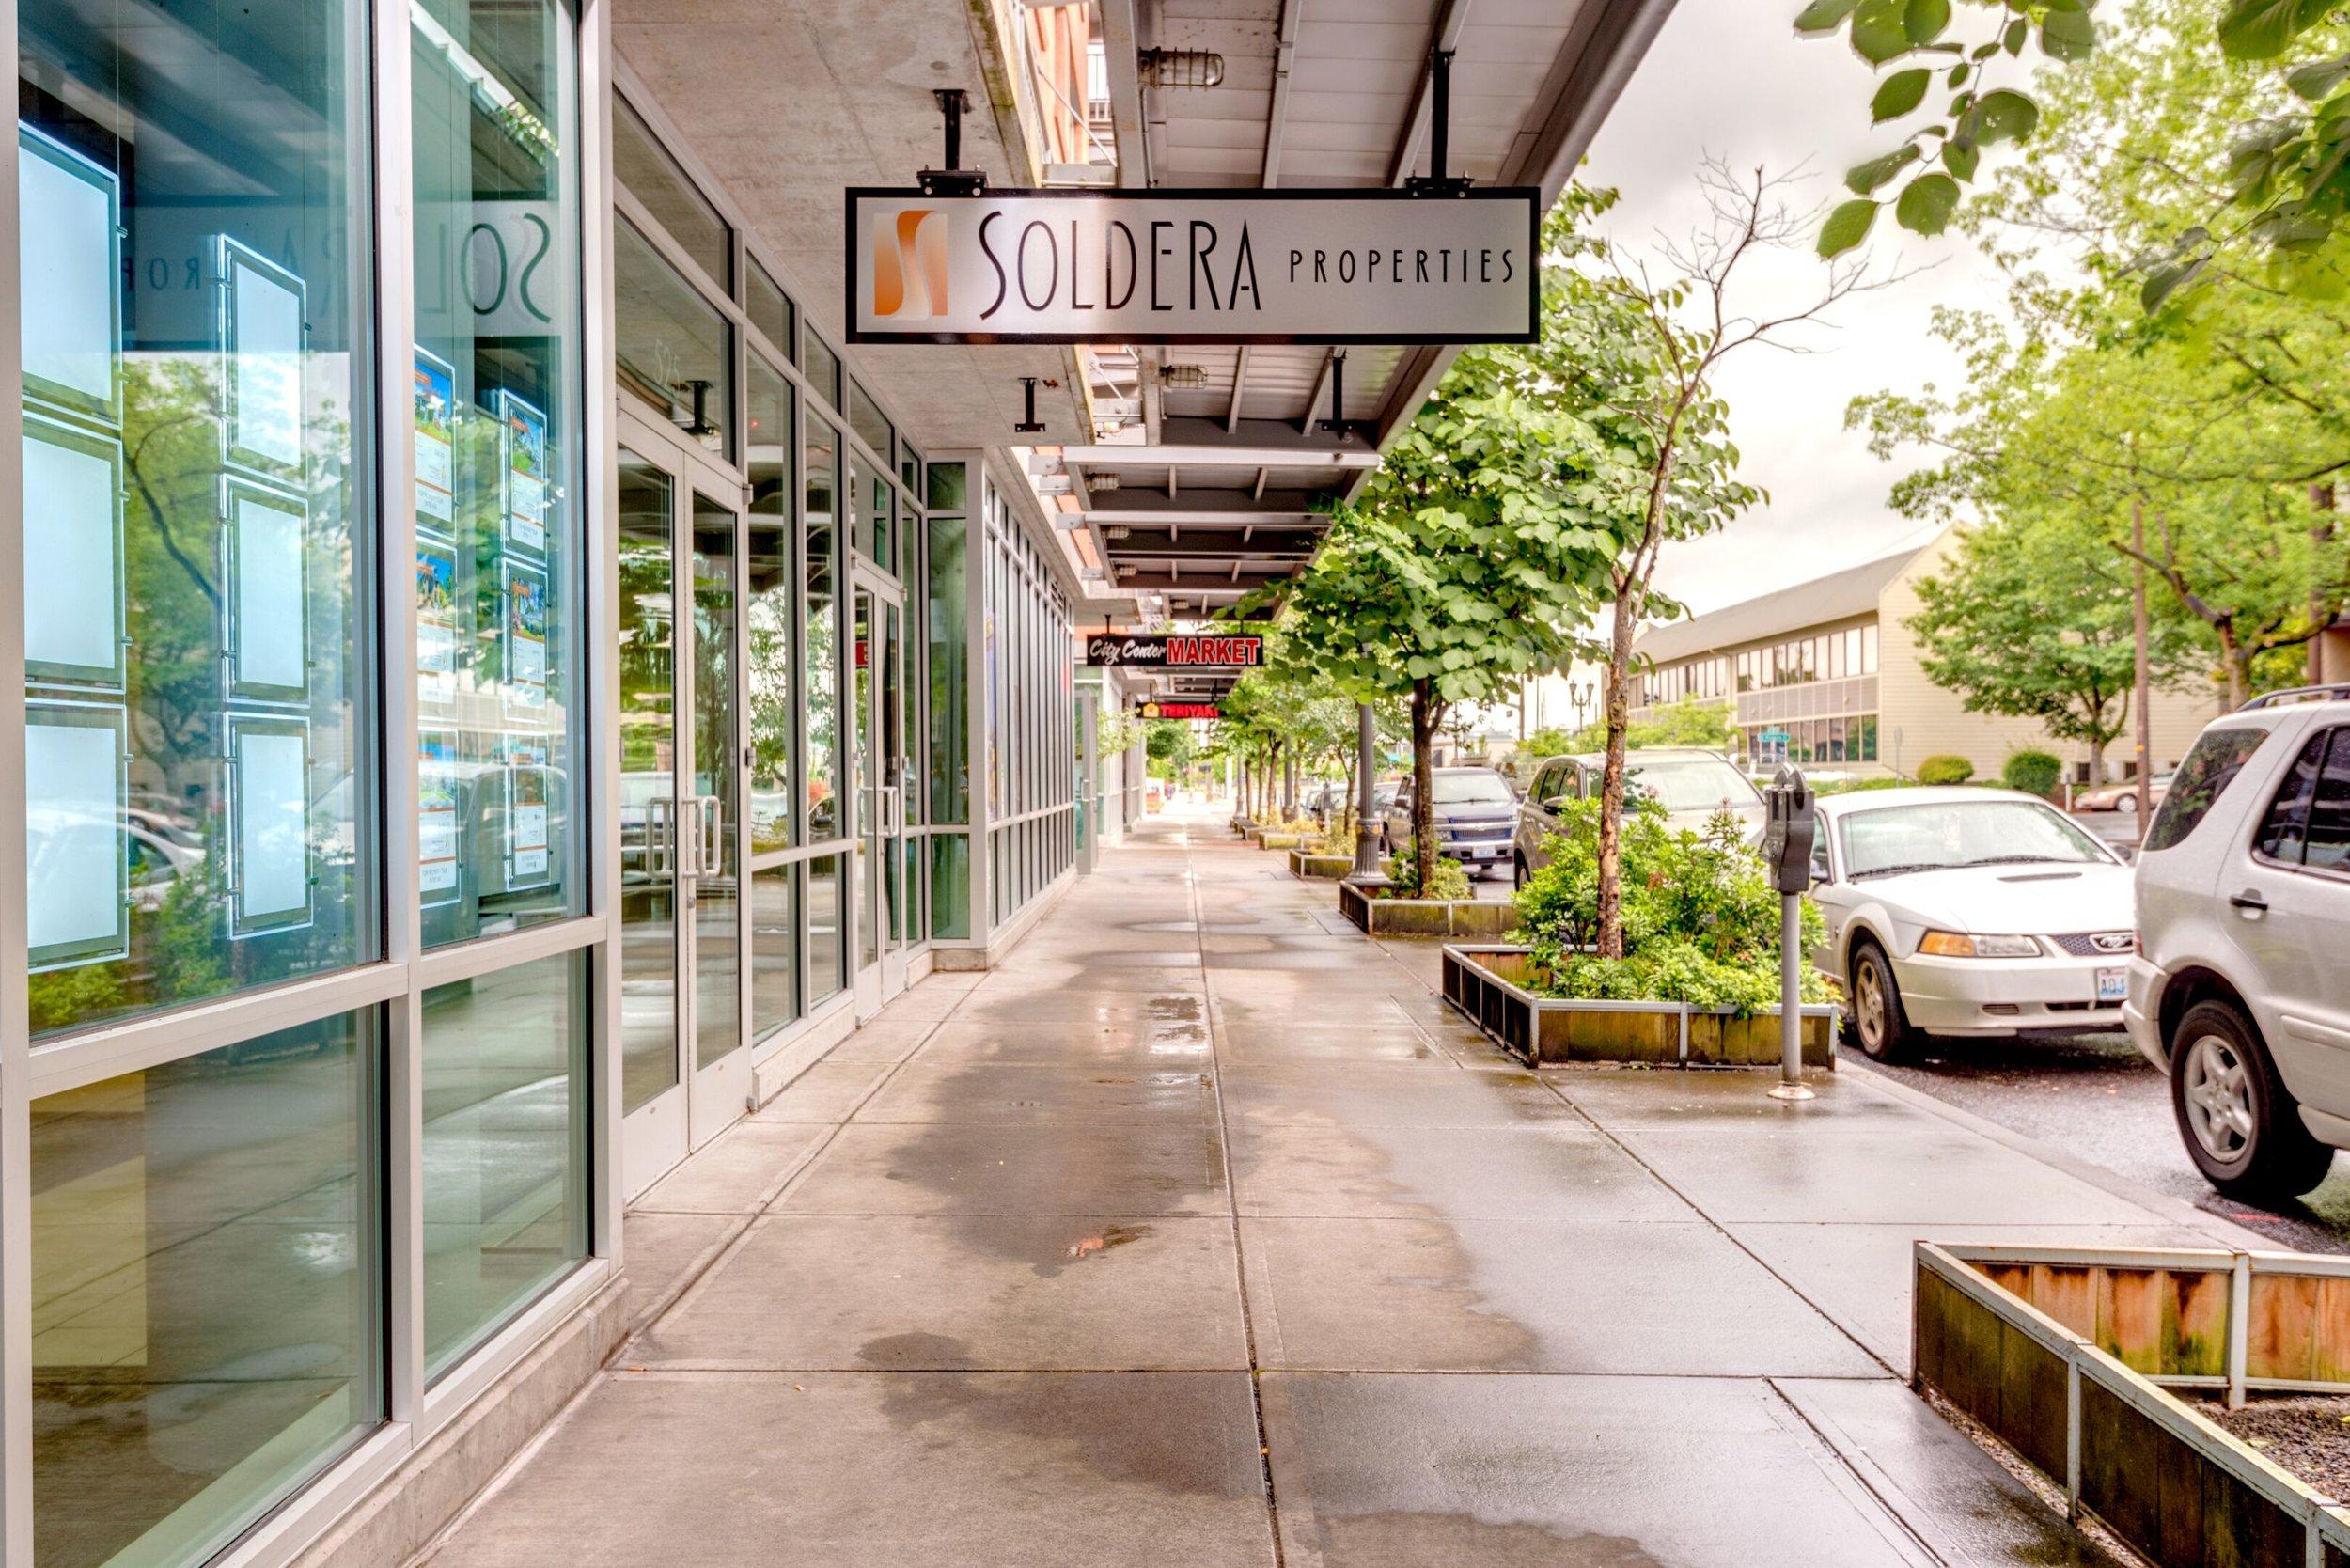 Soldera Properties Promo-15.JPG